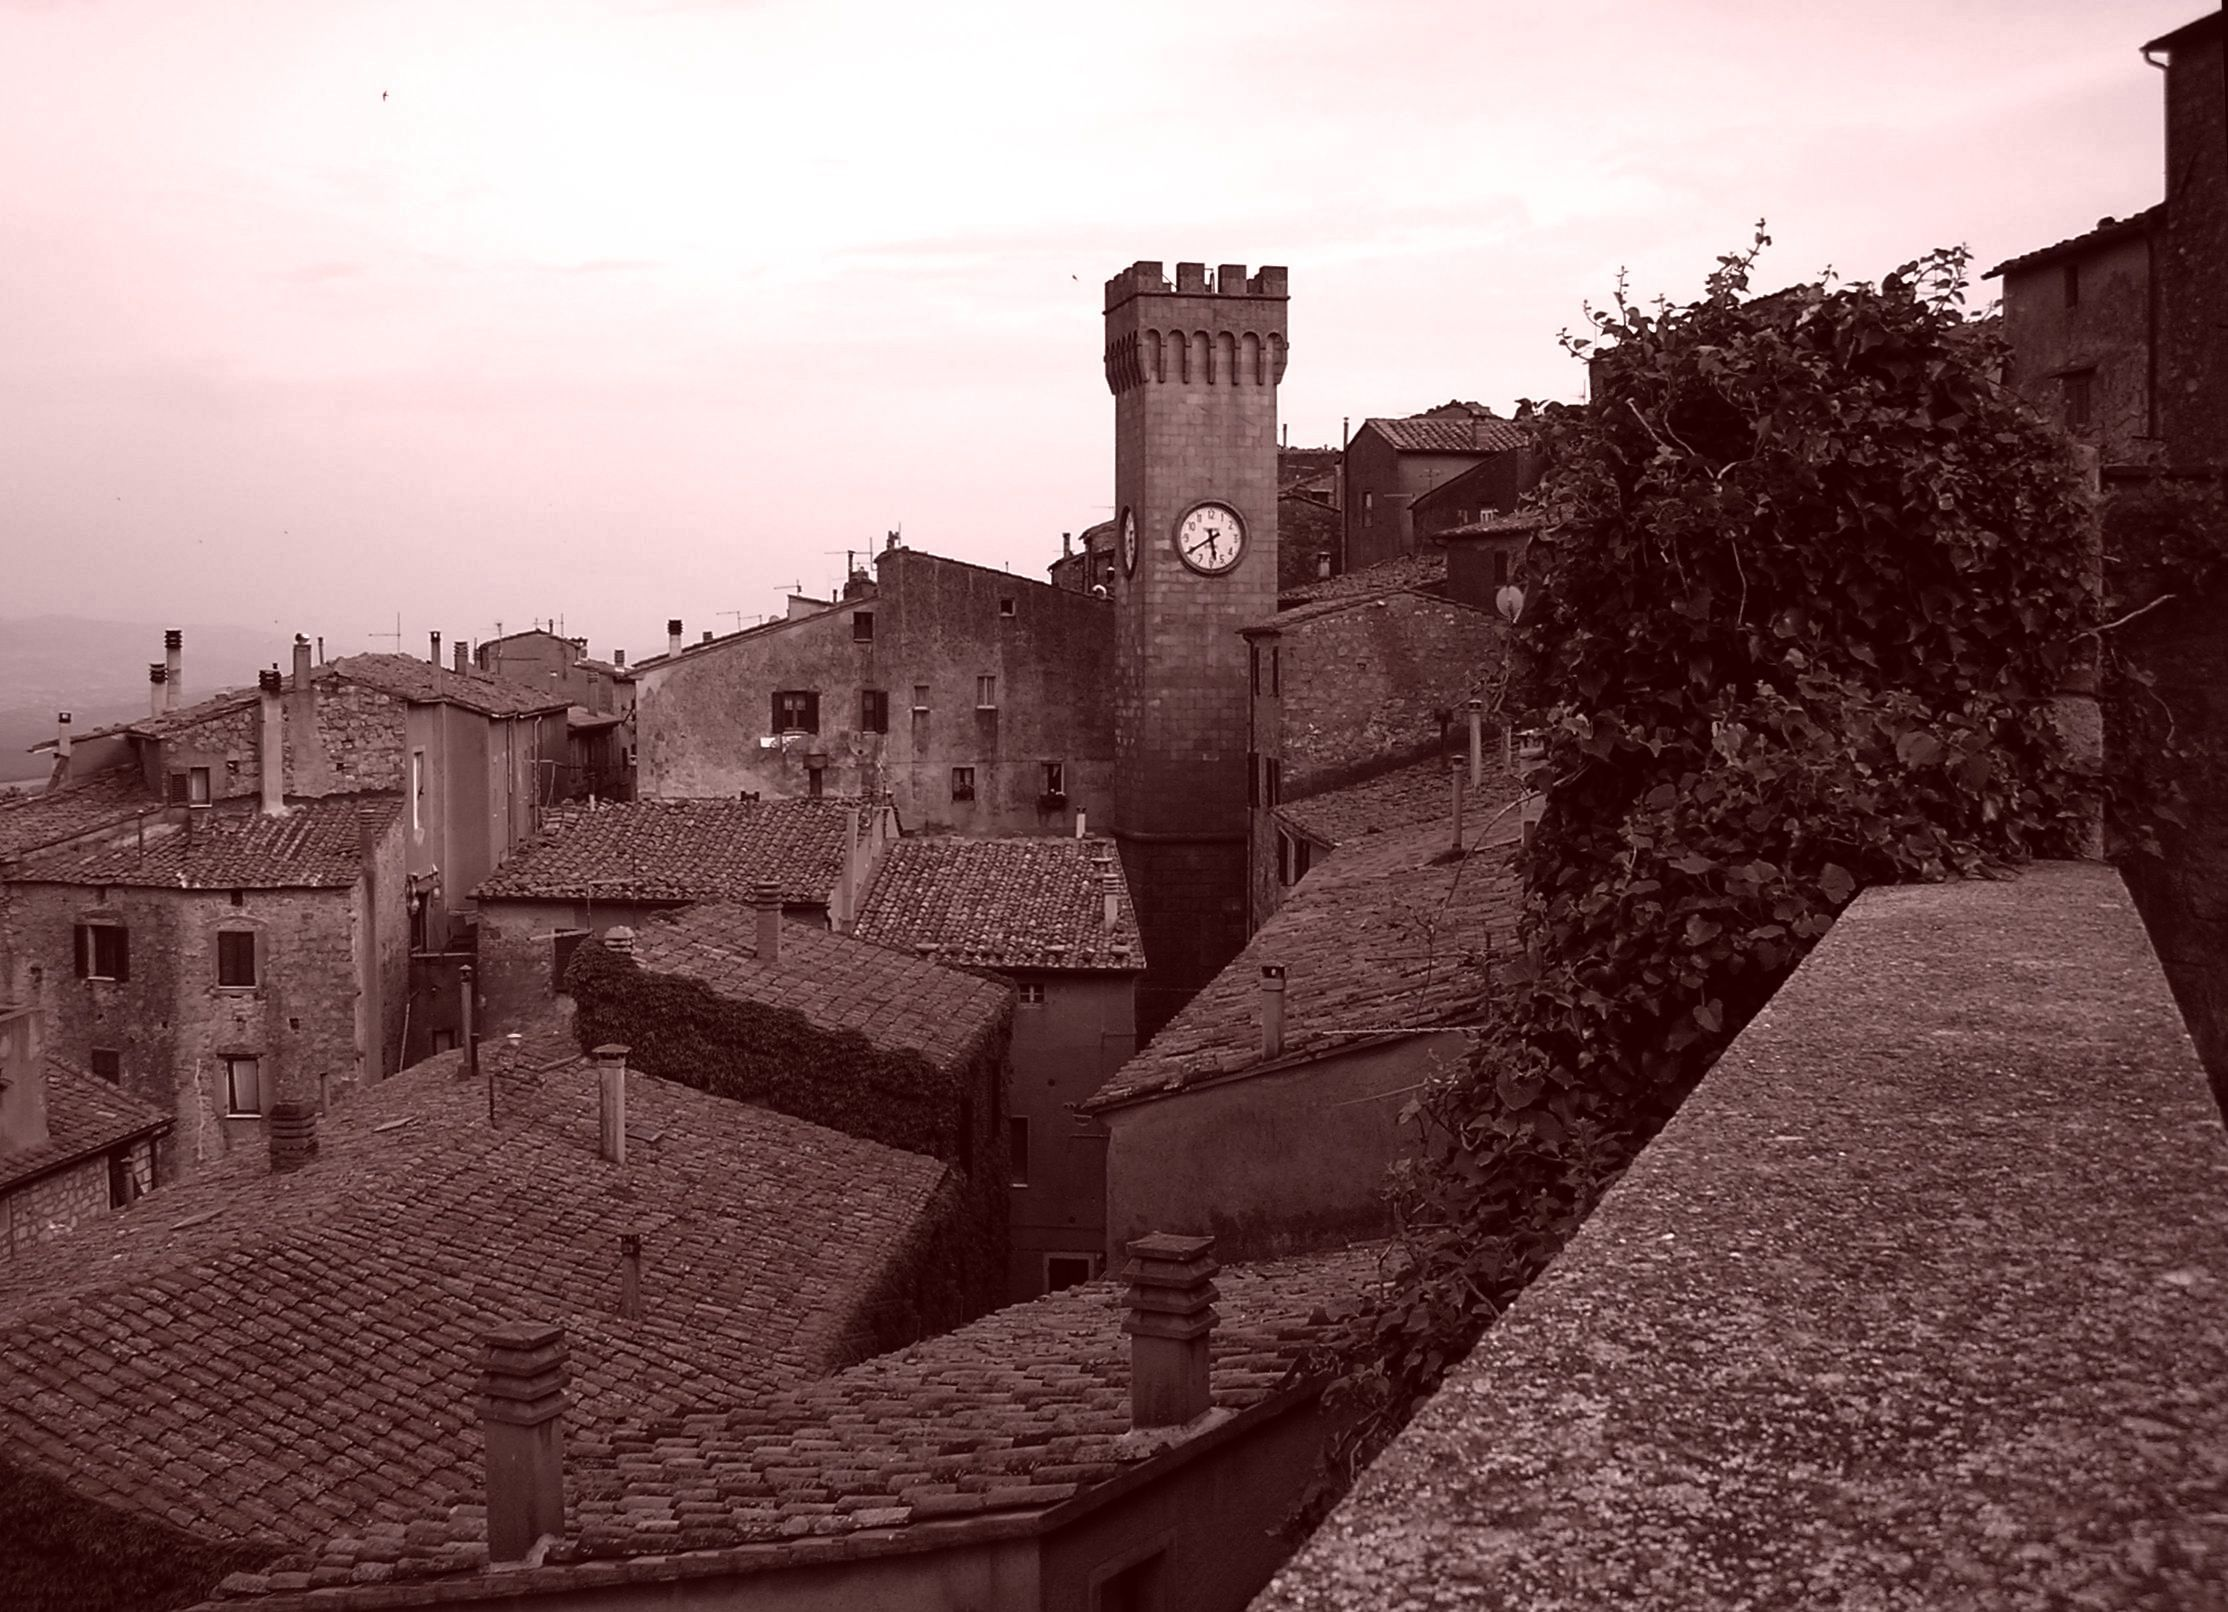 Roccastrada and its old town. #maremma #tuscany #borghi #villages #tradizioni #traditions